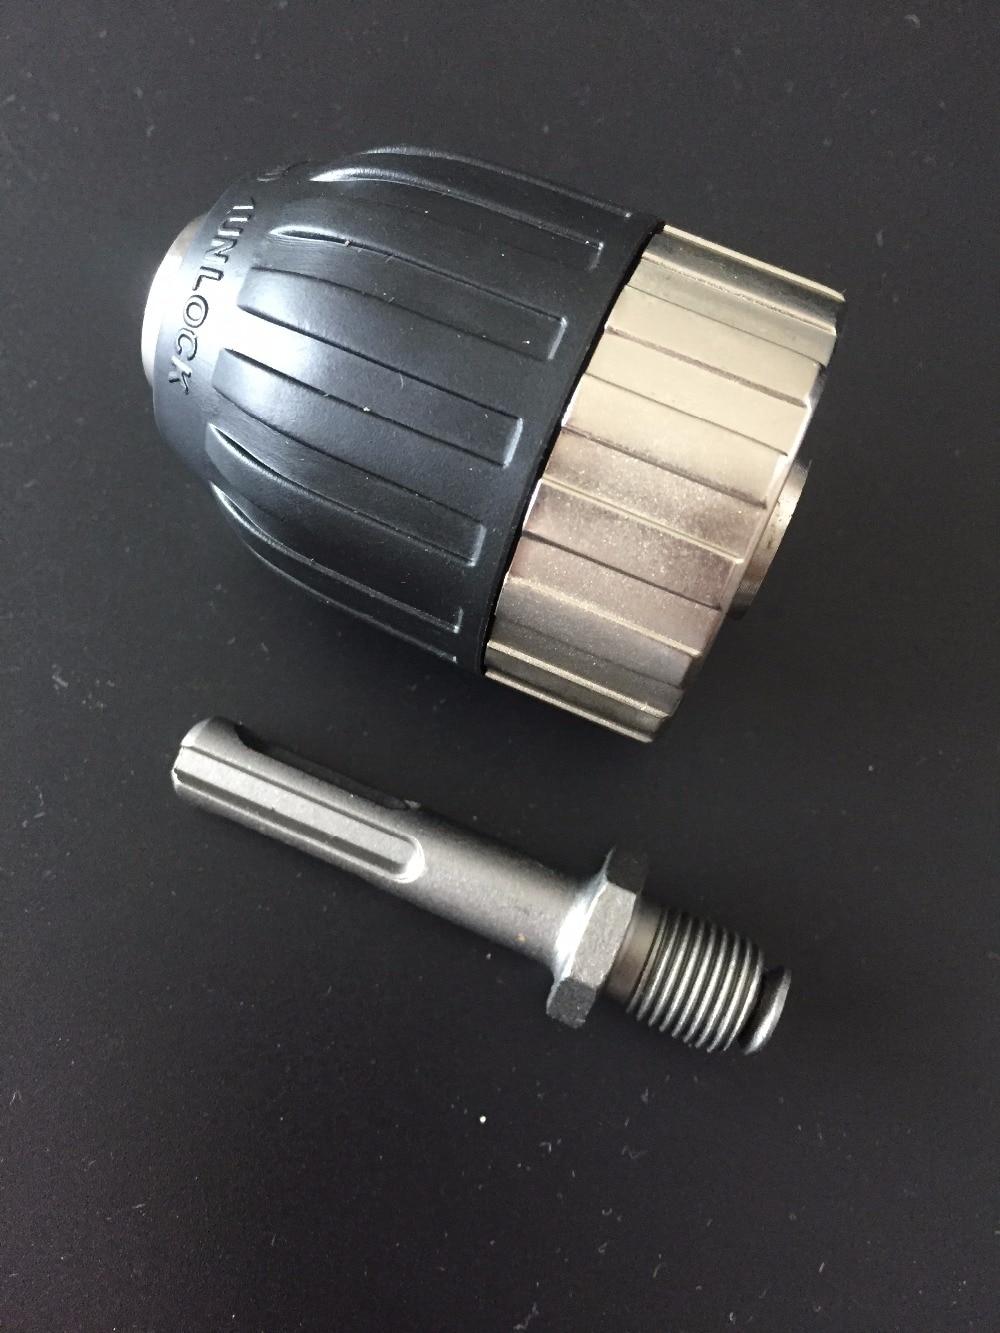 Fixmee 13mm 1/2 Alloy Self-locking Keyless Drill Chuck & SDS Adapter Hardware jt33 keyless drill chuck 1 13mm 1 32 1 2 self tighten with r8 shank adapter top quality